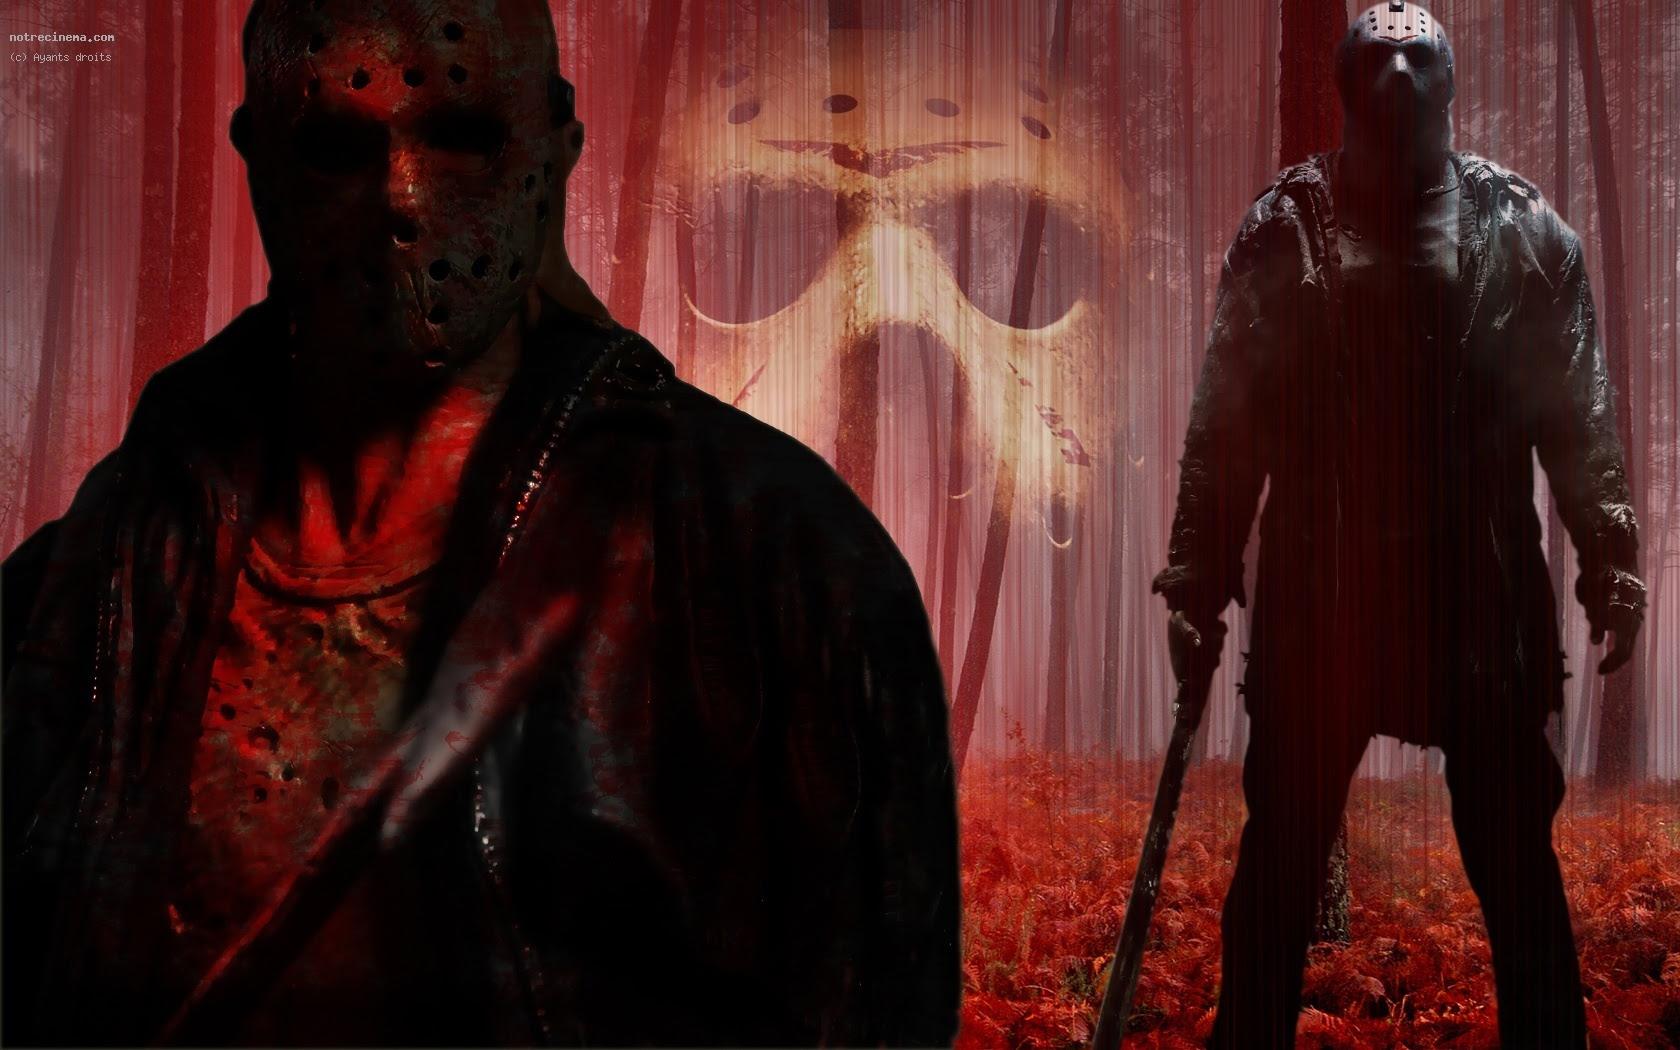 Jason Voorhees Friday The 13th 2009 Wallpaper 30662131 Fanpop